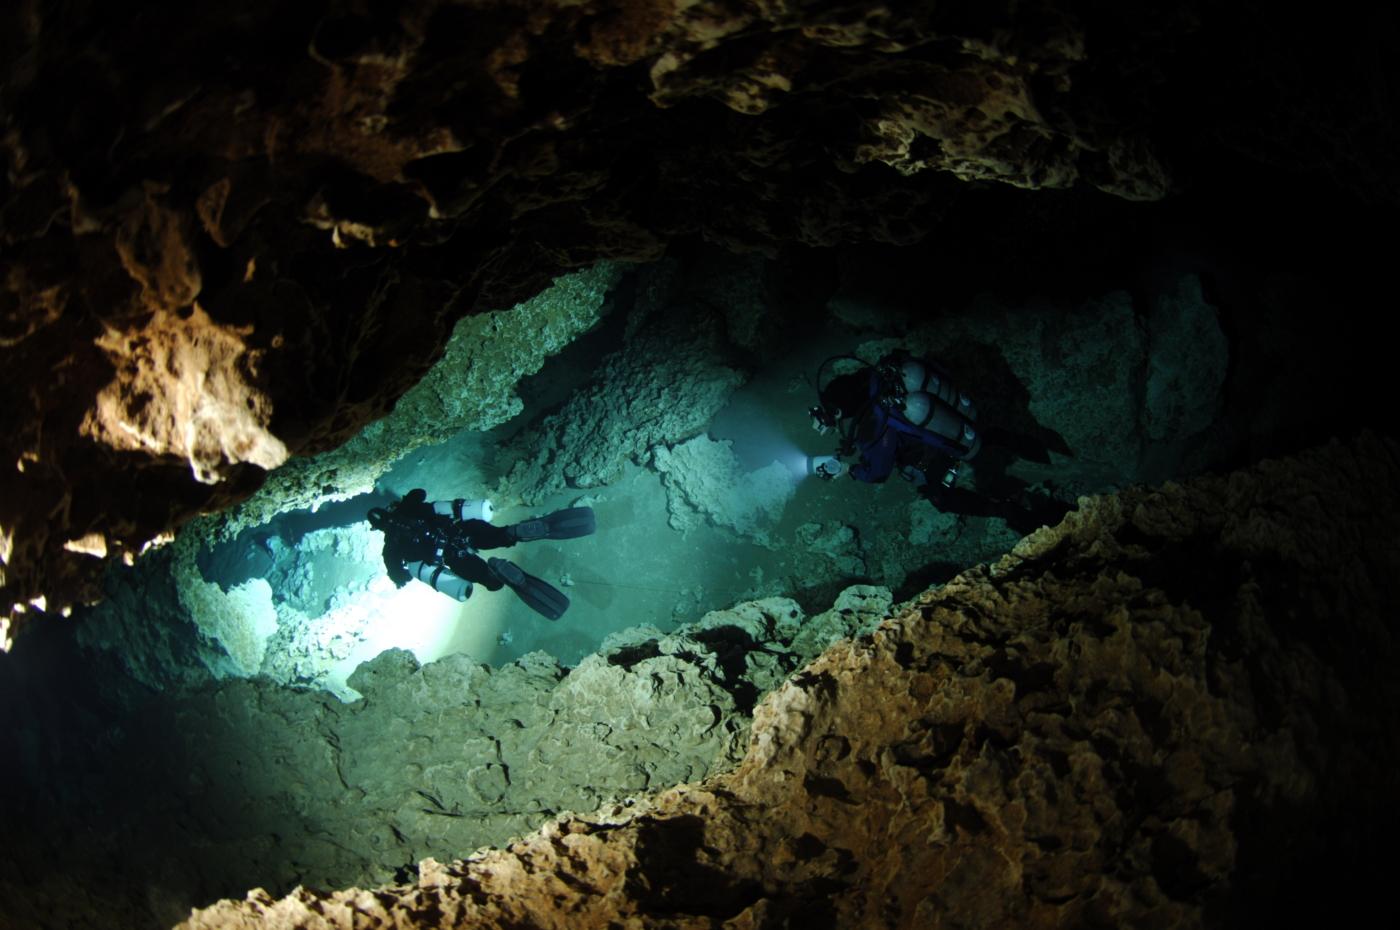 Image of scuba divers cave diving.